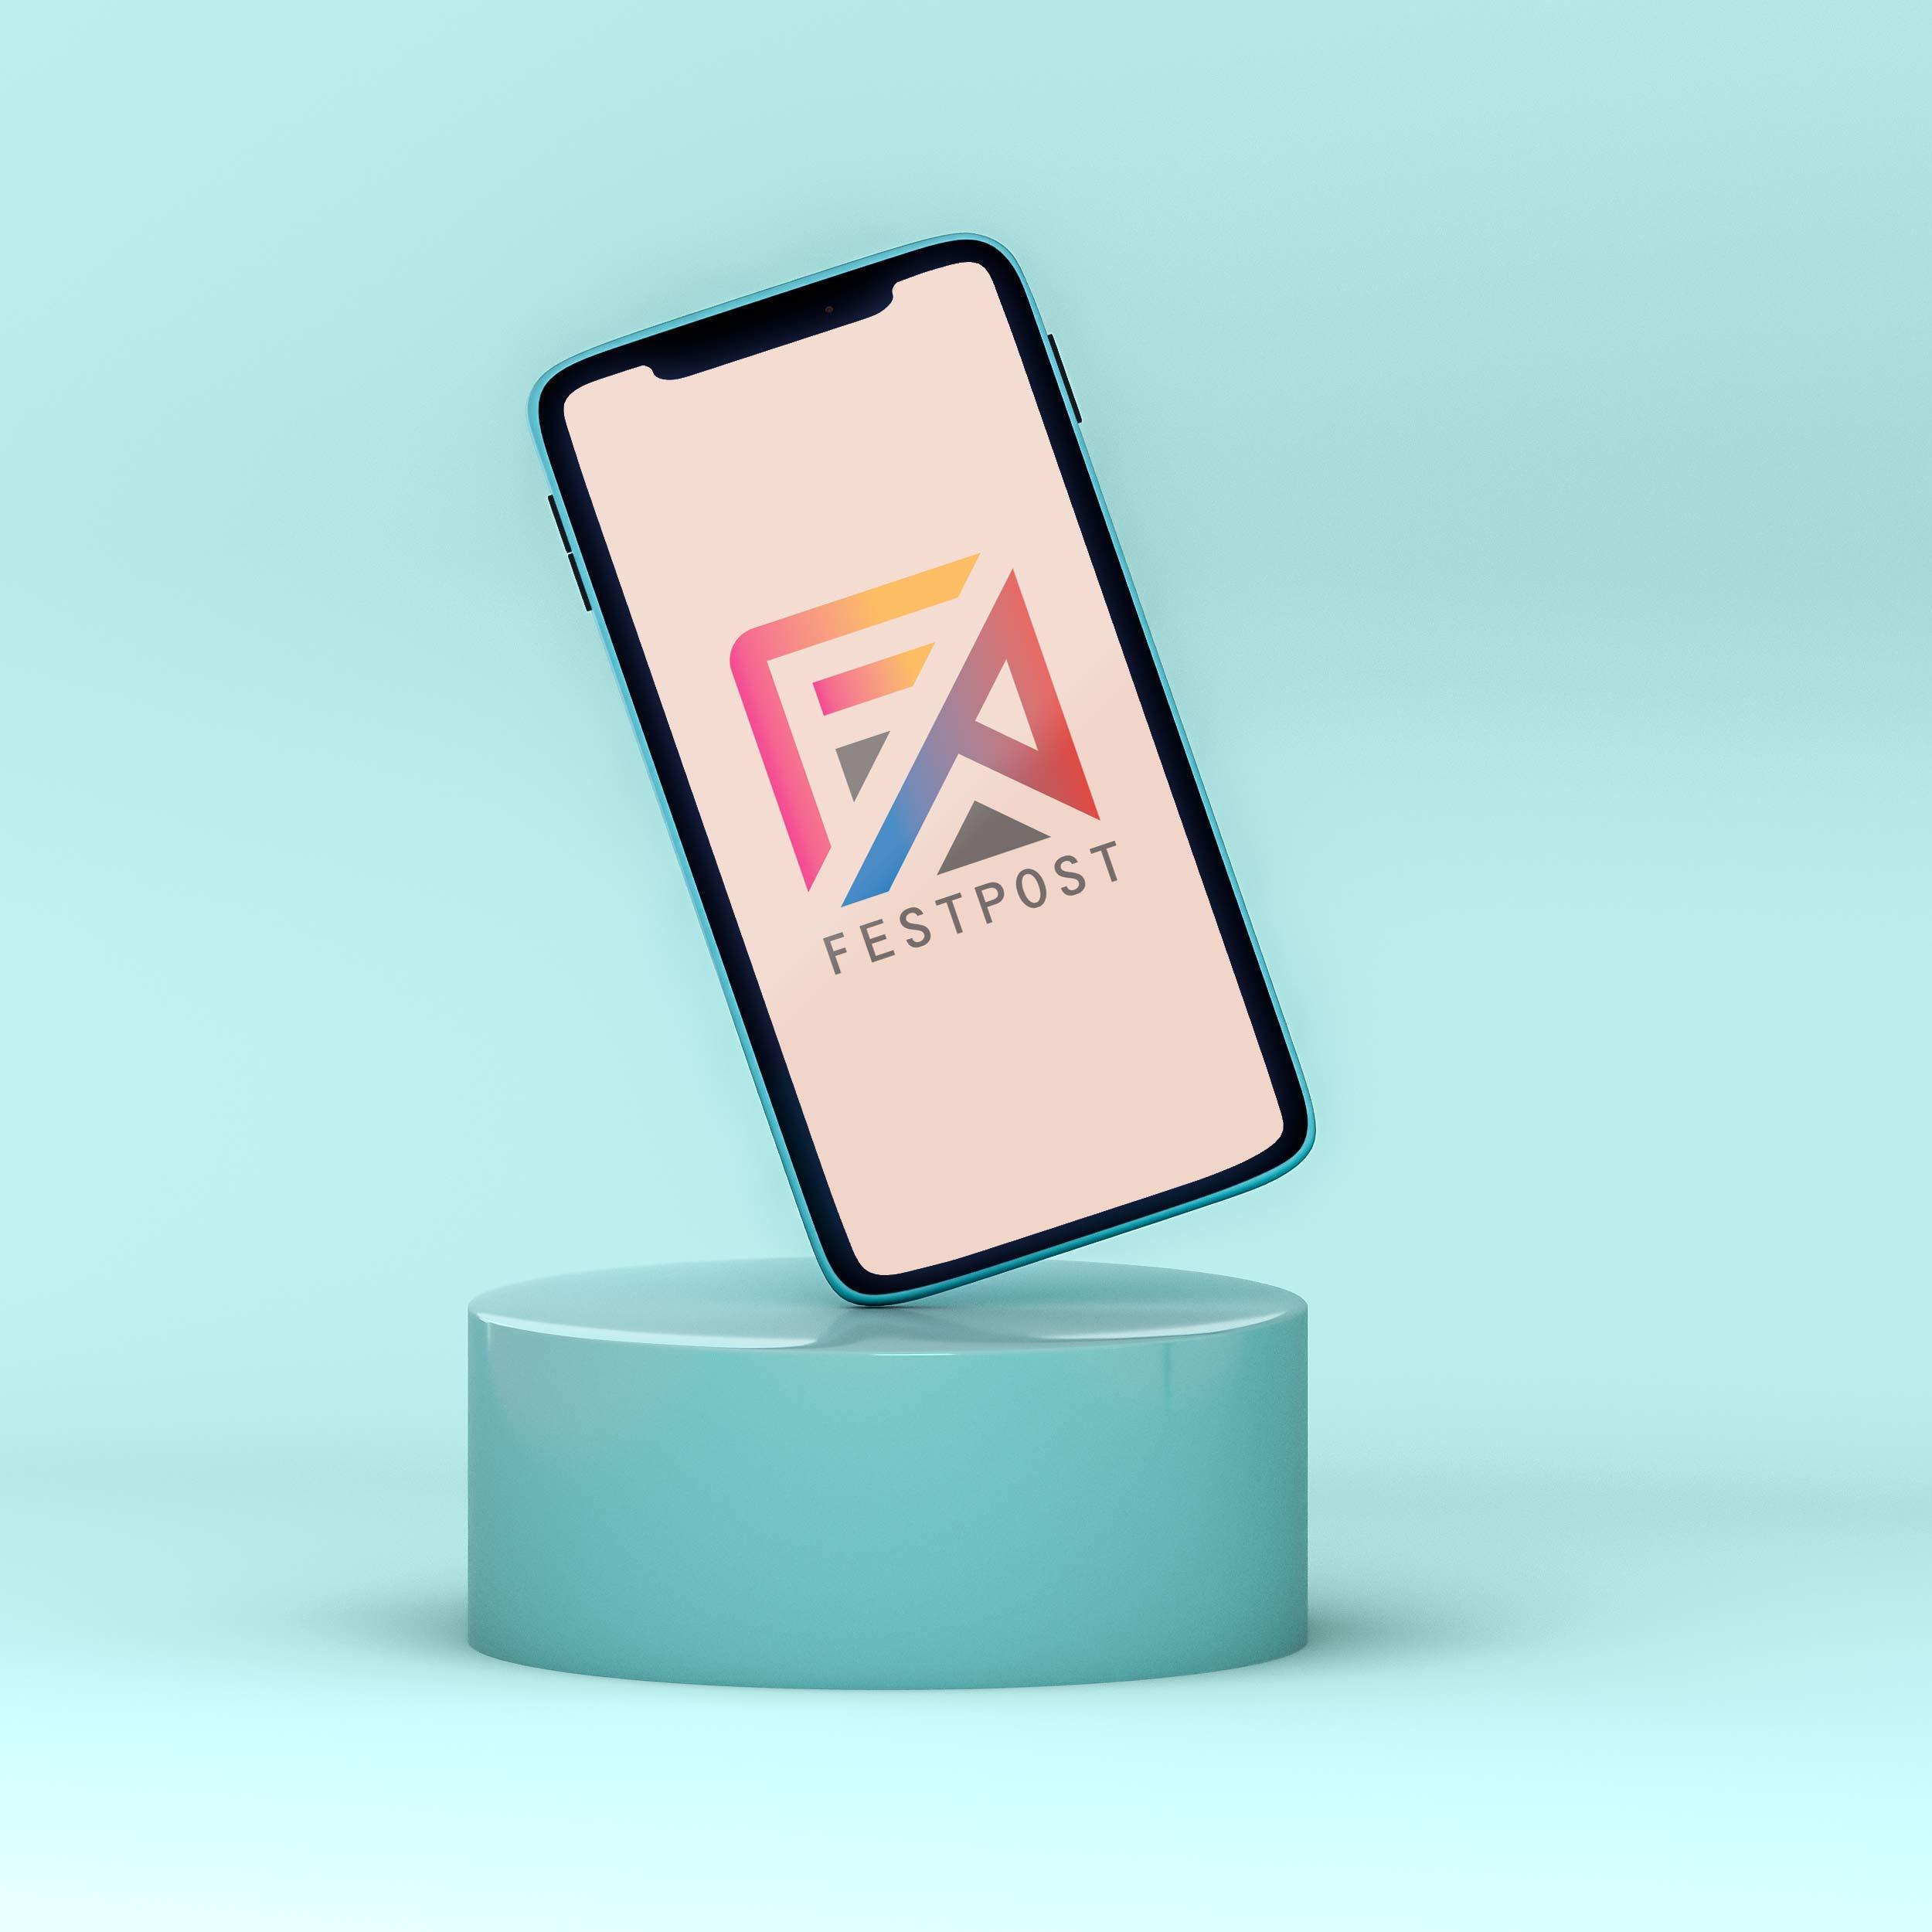 Festival social media marketing post design app icon design by Badri Design